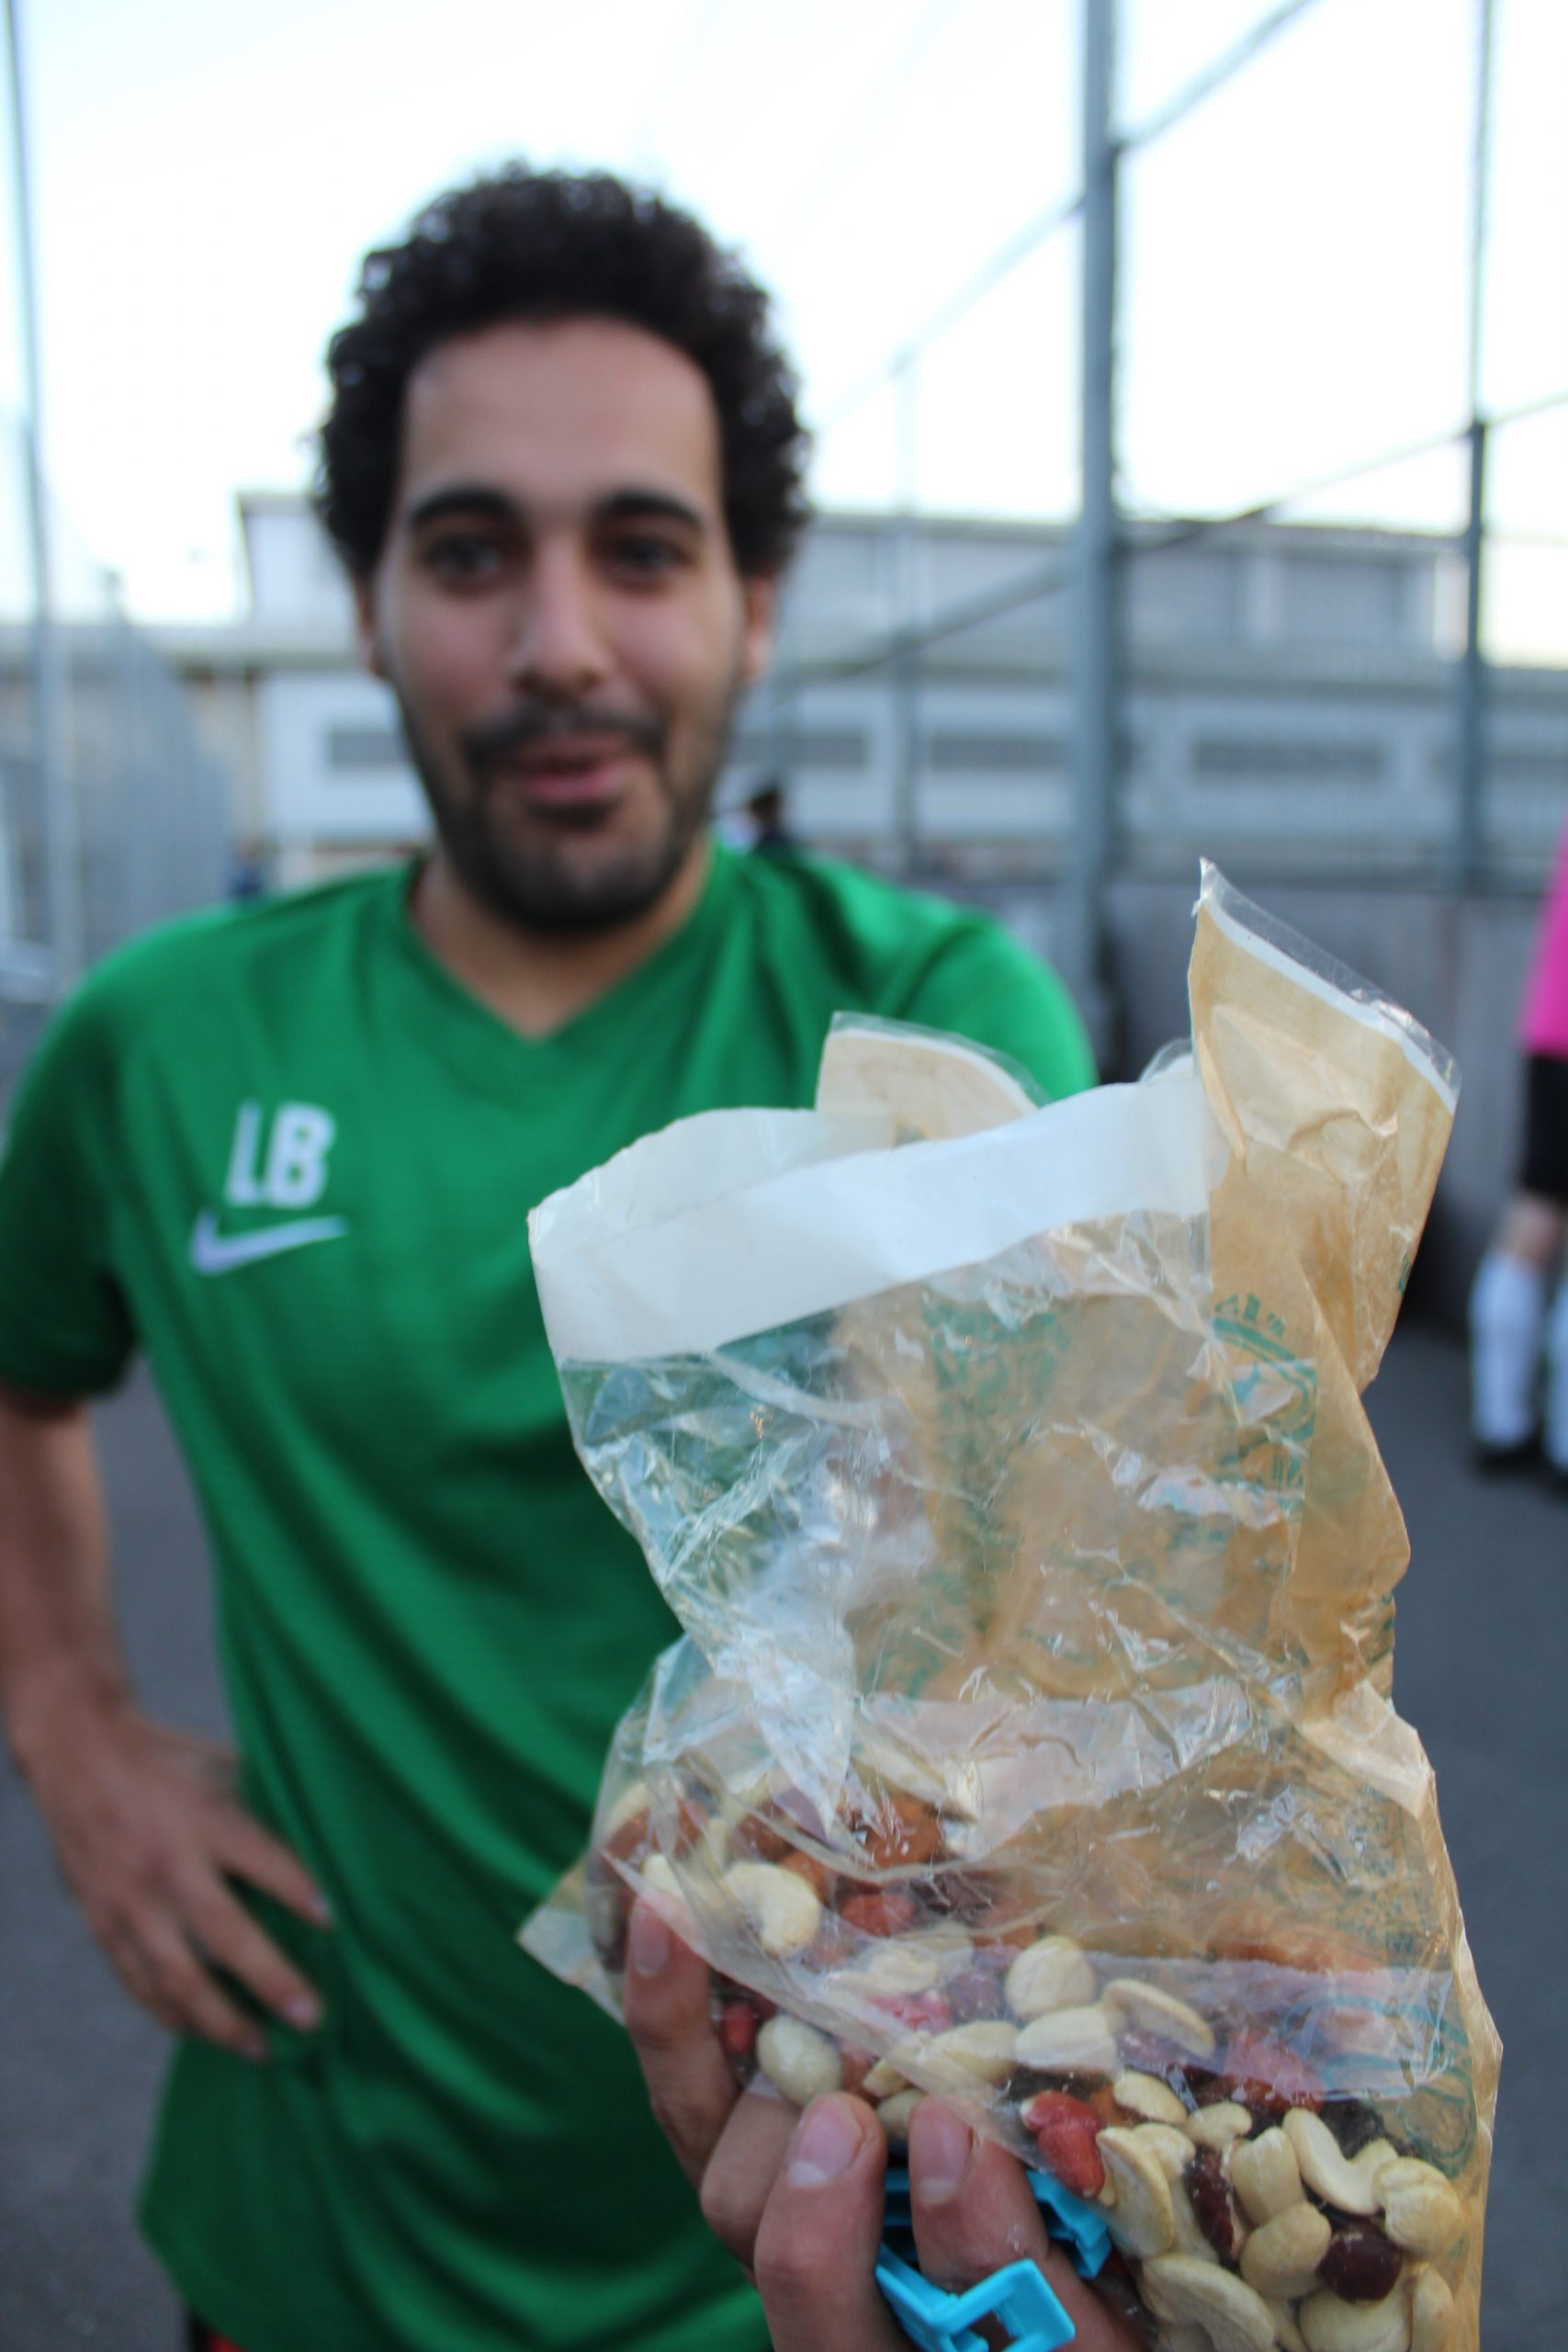 Vegan football team Kale Madrid gain sponsorship 1